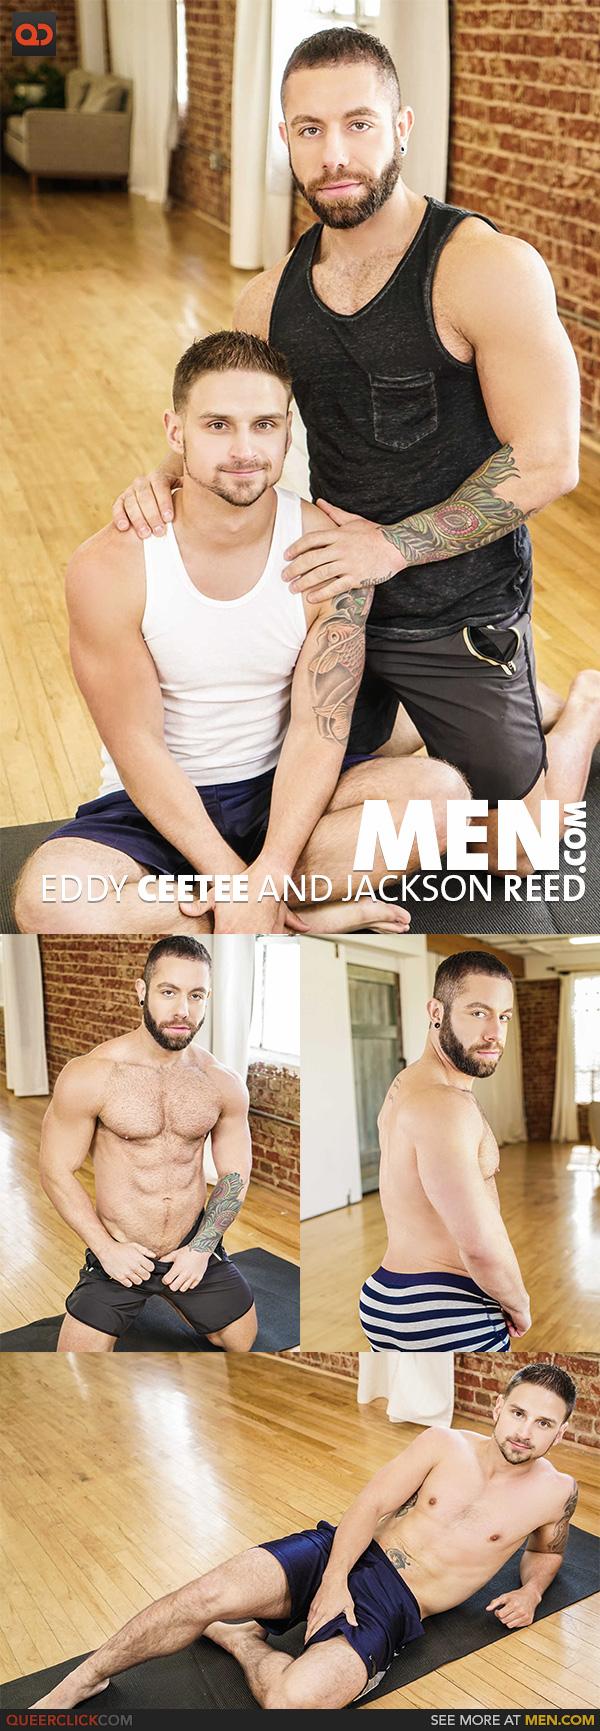 Men.com:  Eddy Ceetee and Jackson Reed